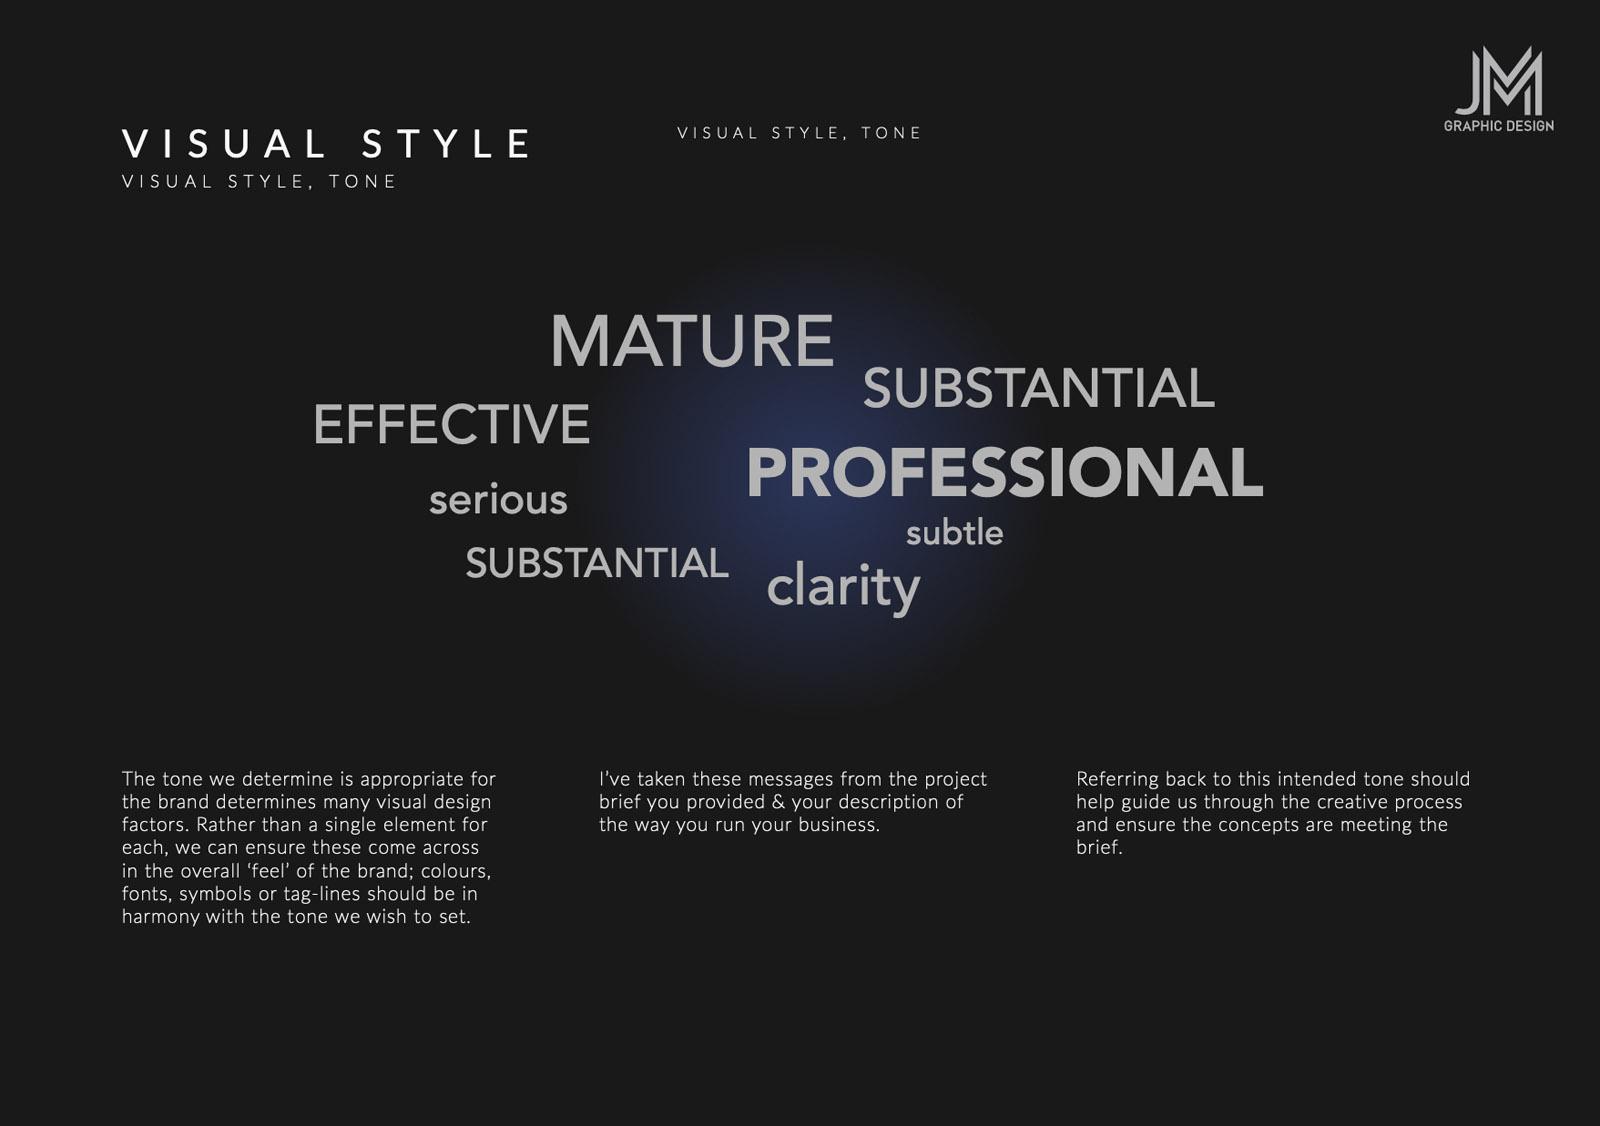 brand-identity-design-documentary-photographer-04